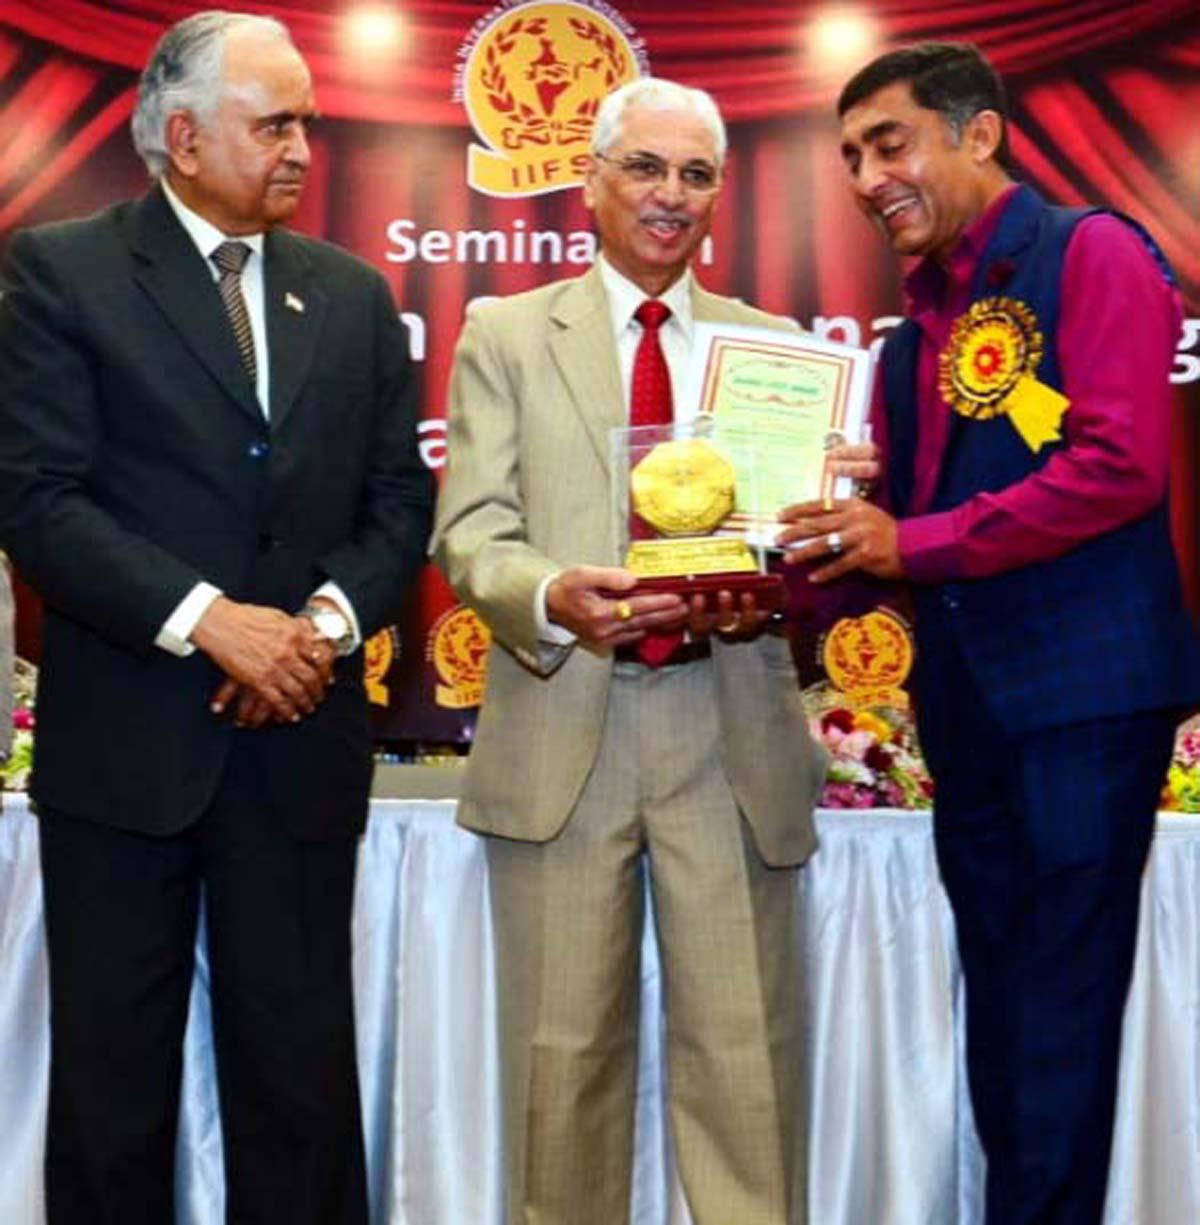 Suneel Mahajan, a noted social worker from Jammu receiving 'Bharat Jyoti Award' from a dignitary at New Delhi.